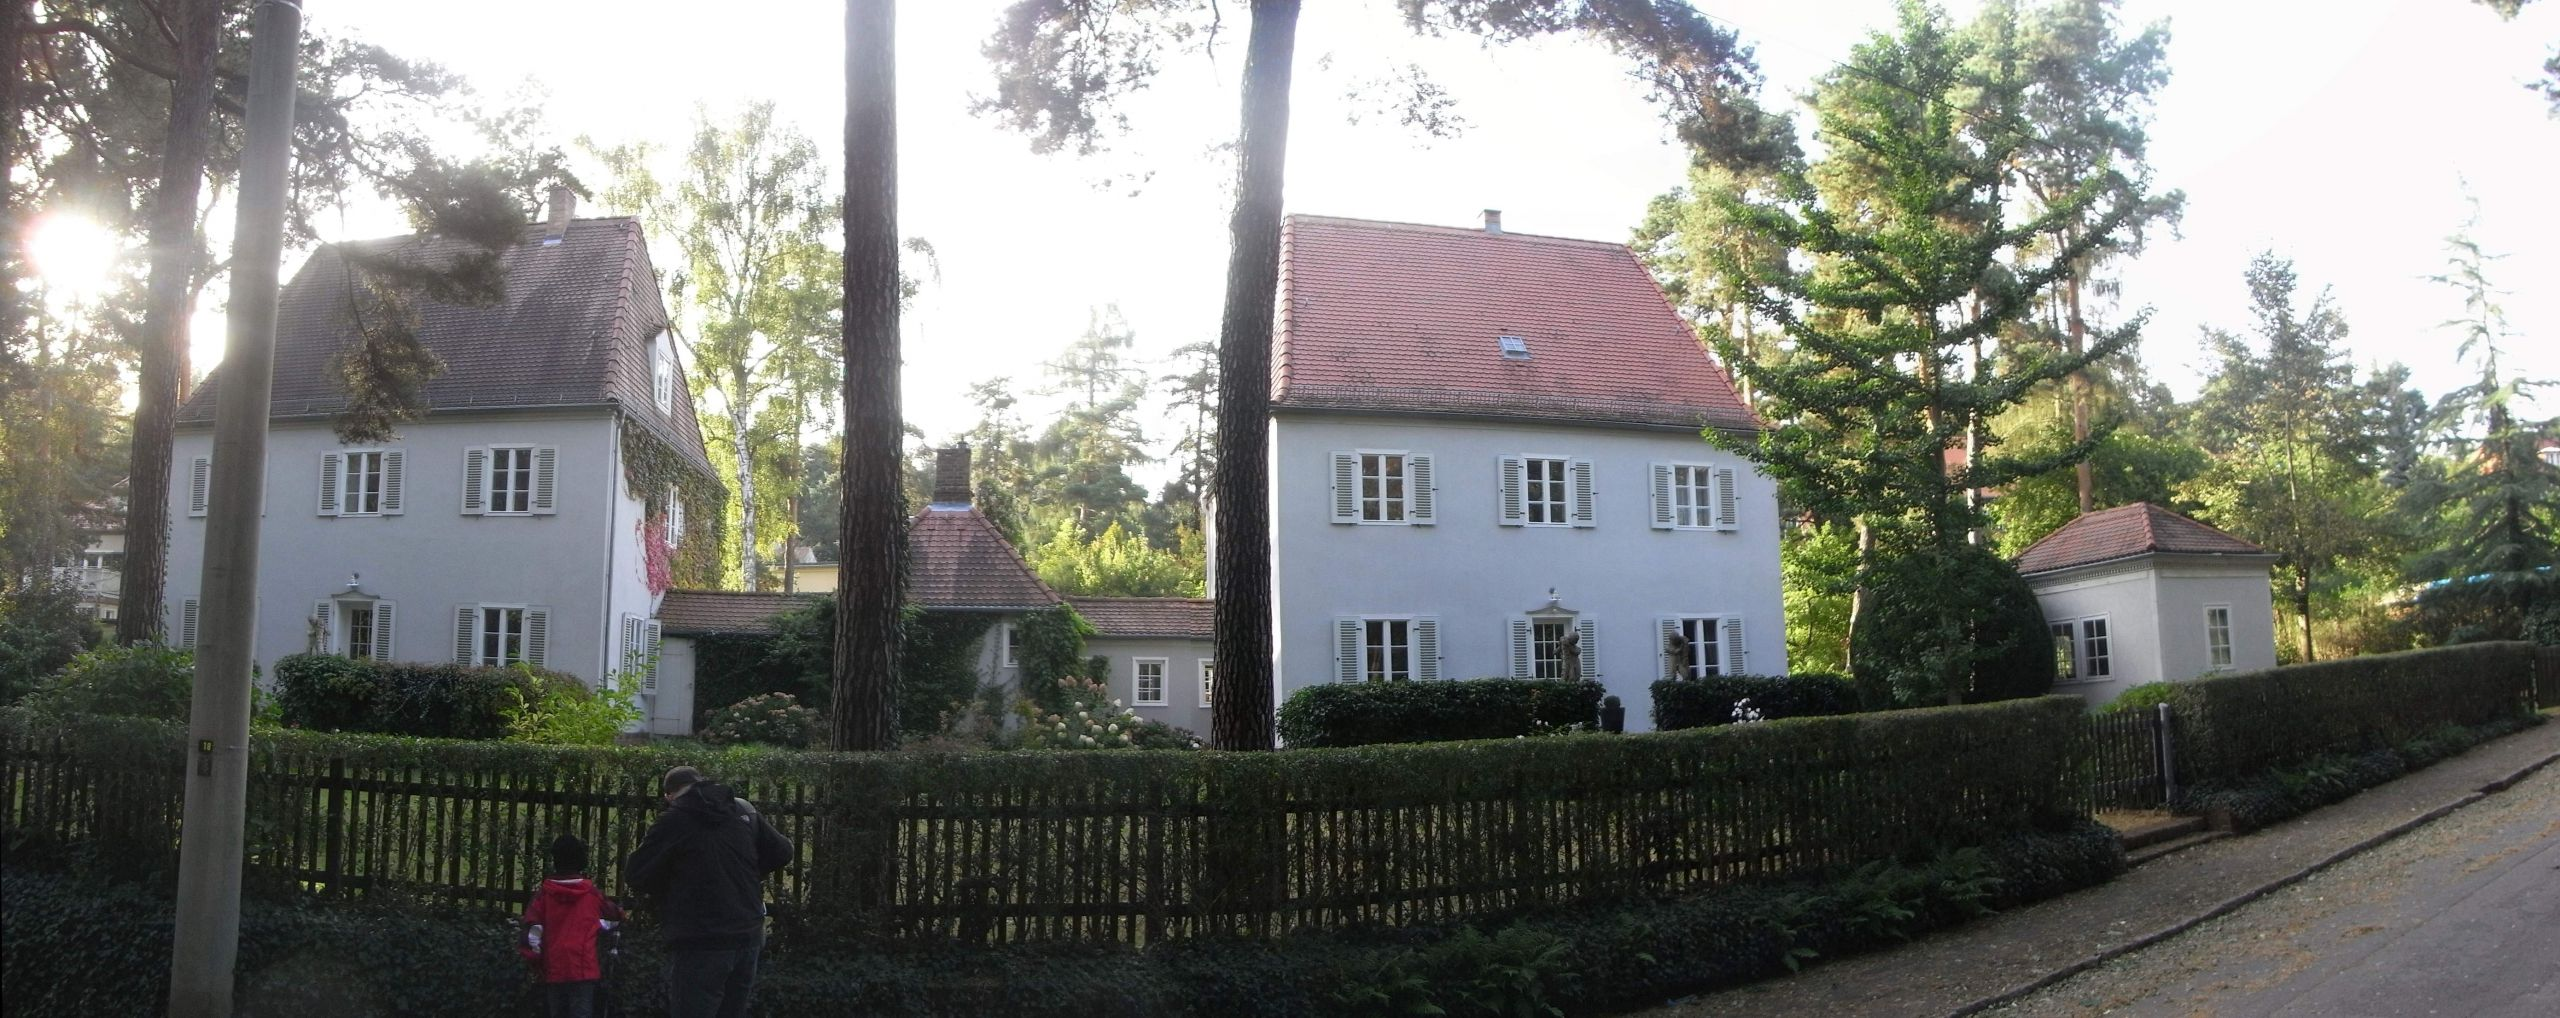 Tessenow Hellerau Heideweg